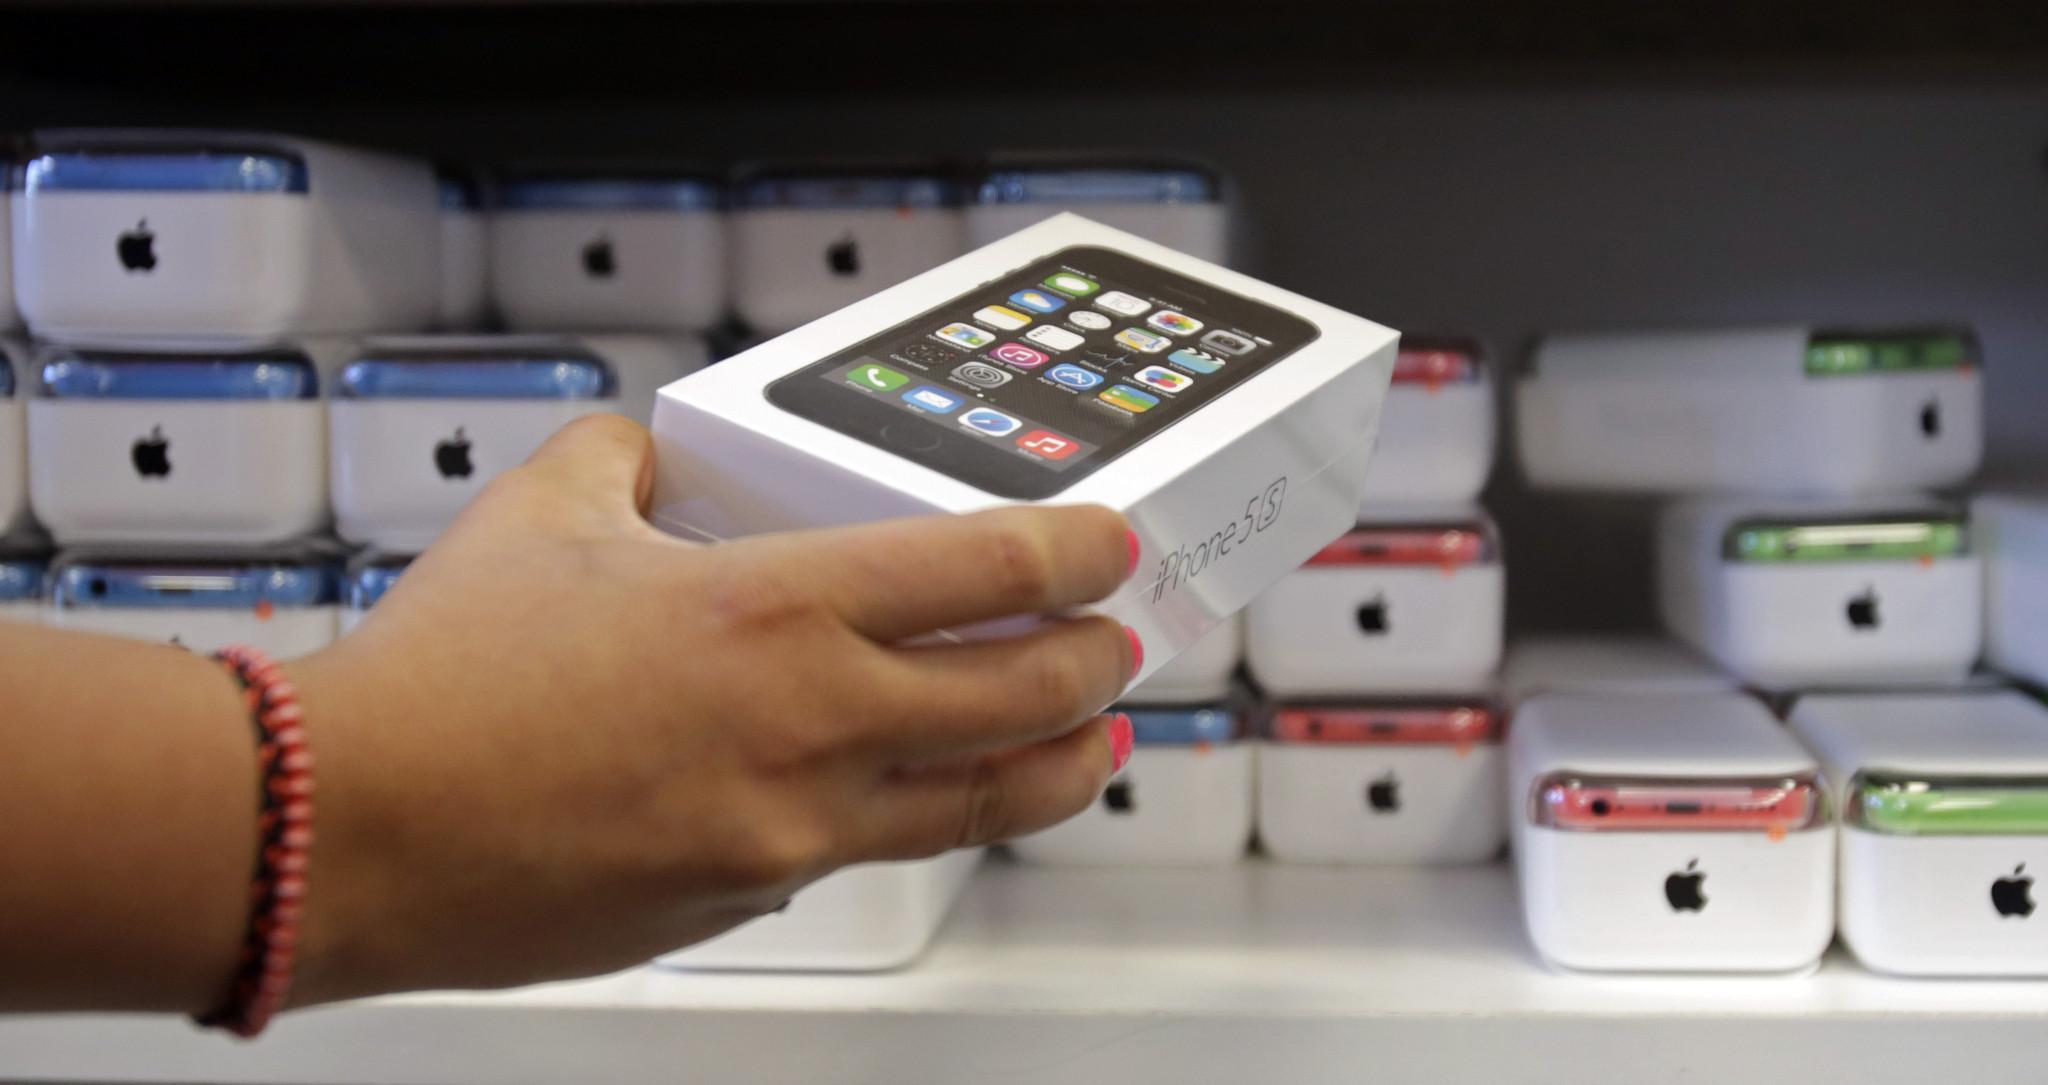 Apple denies creating iPhone